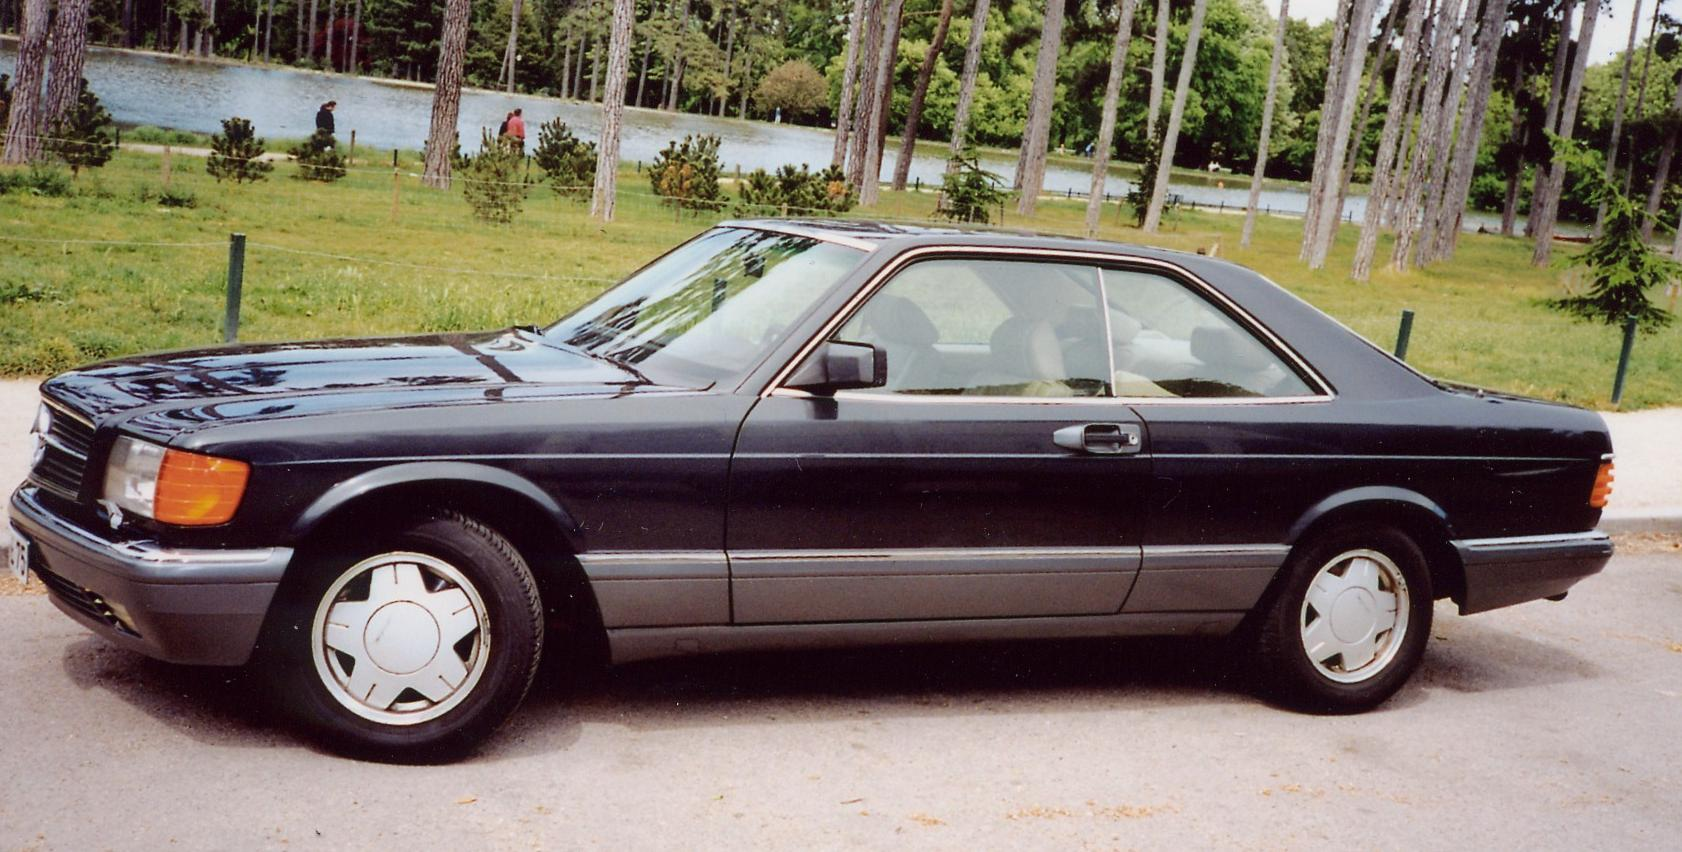 File 1986 1991 mercedes benz 560 sec c126 coupe for Mercedes benz 560